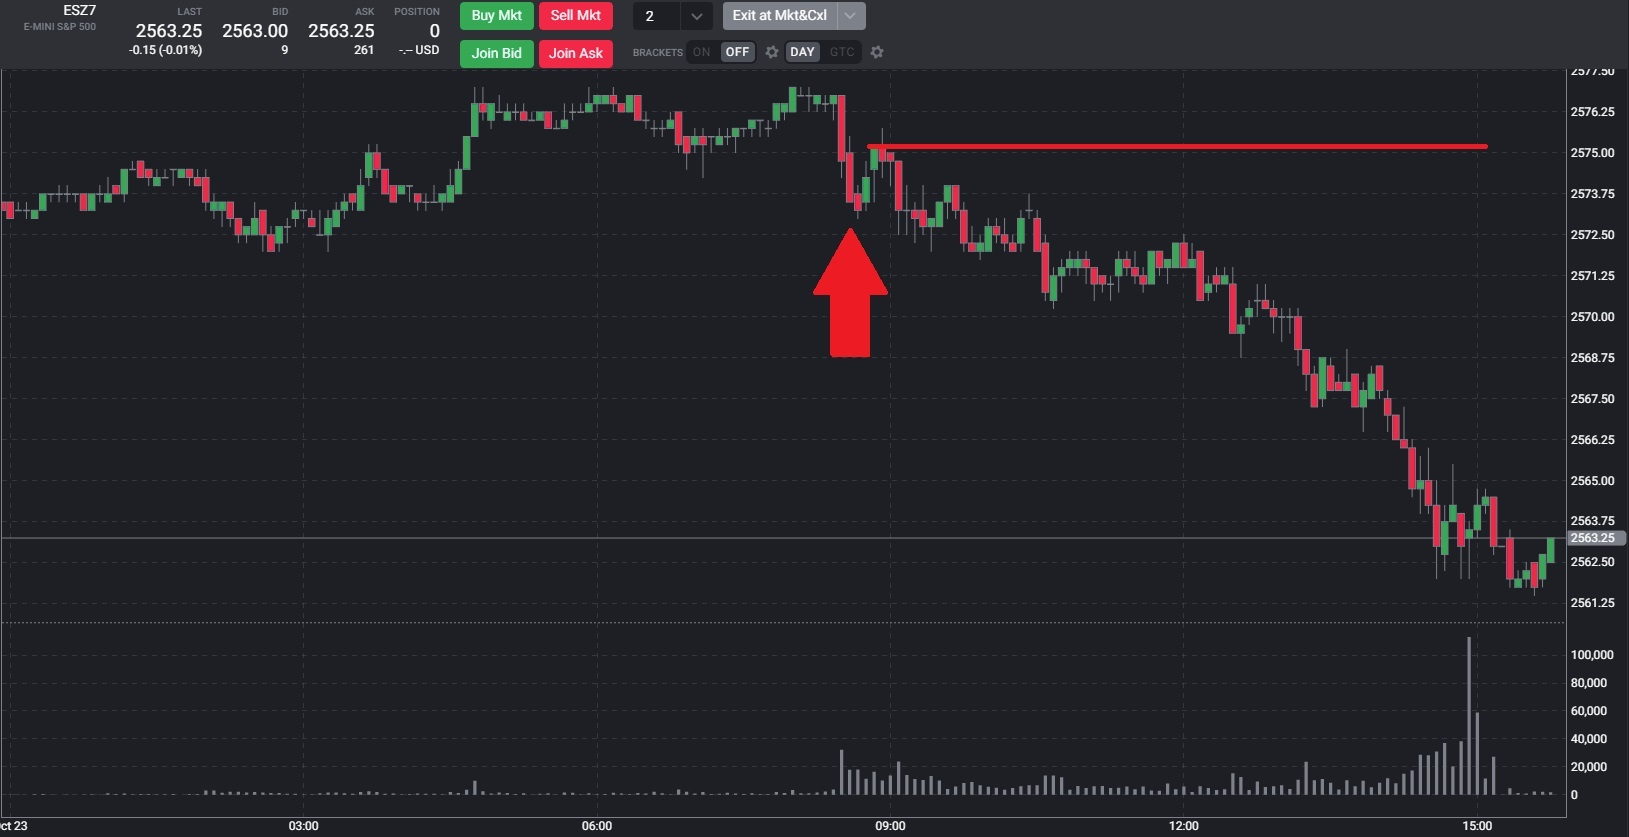 EMini Chart Oct 23.jpg